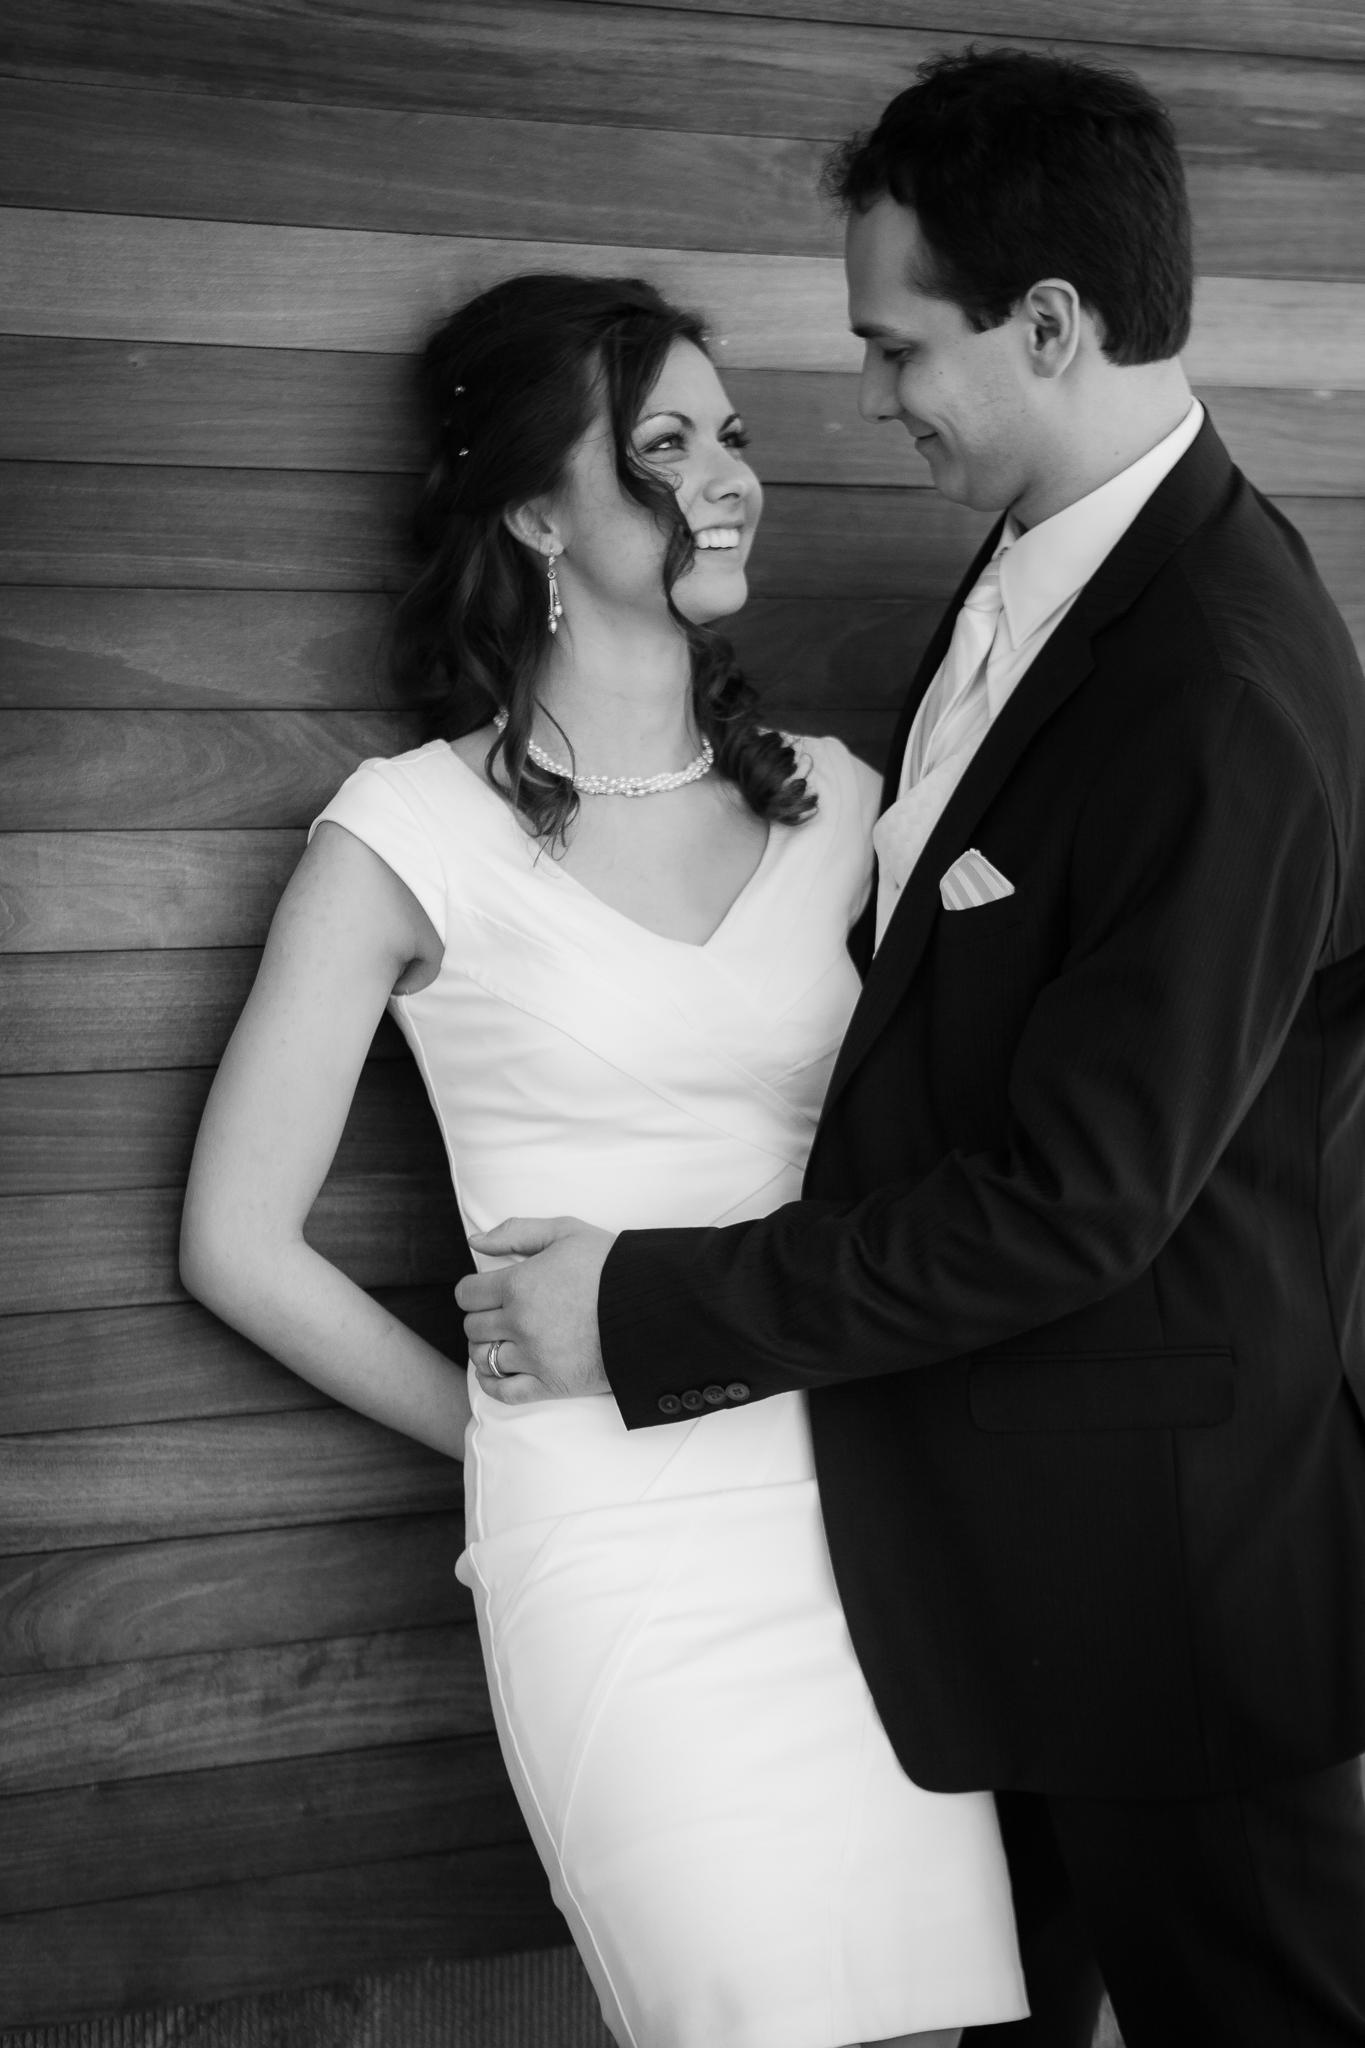 Toronto Wedding Photography - Zoya & Alexei -25.jpg